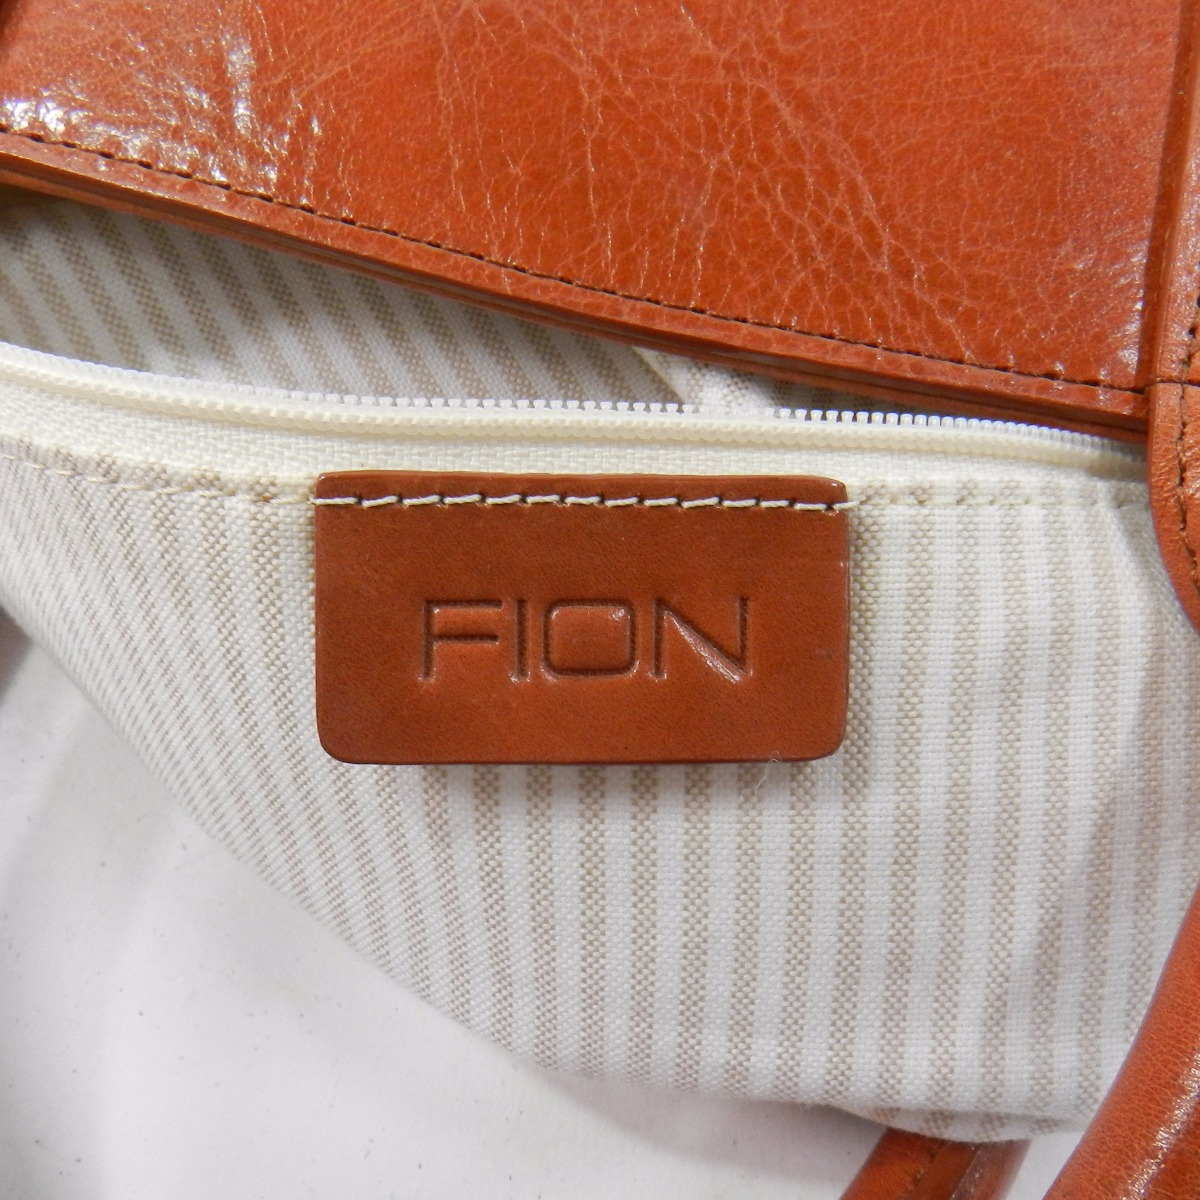 FION标识型推手提包皮革女士